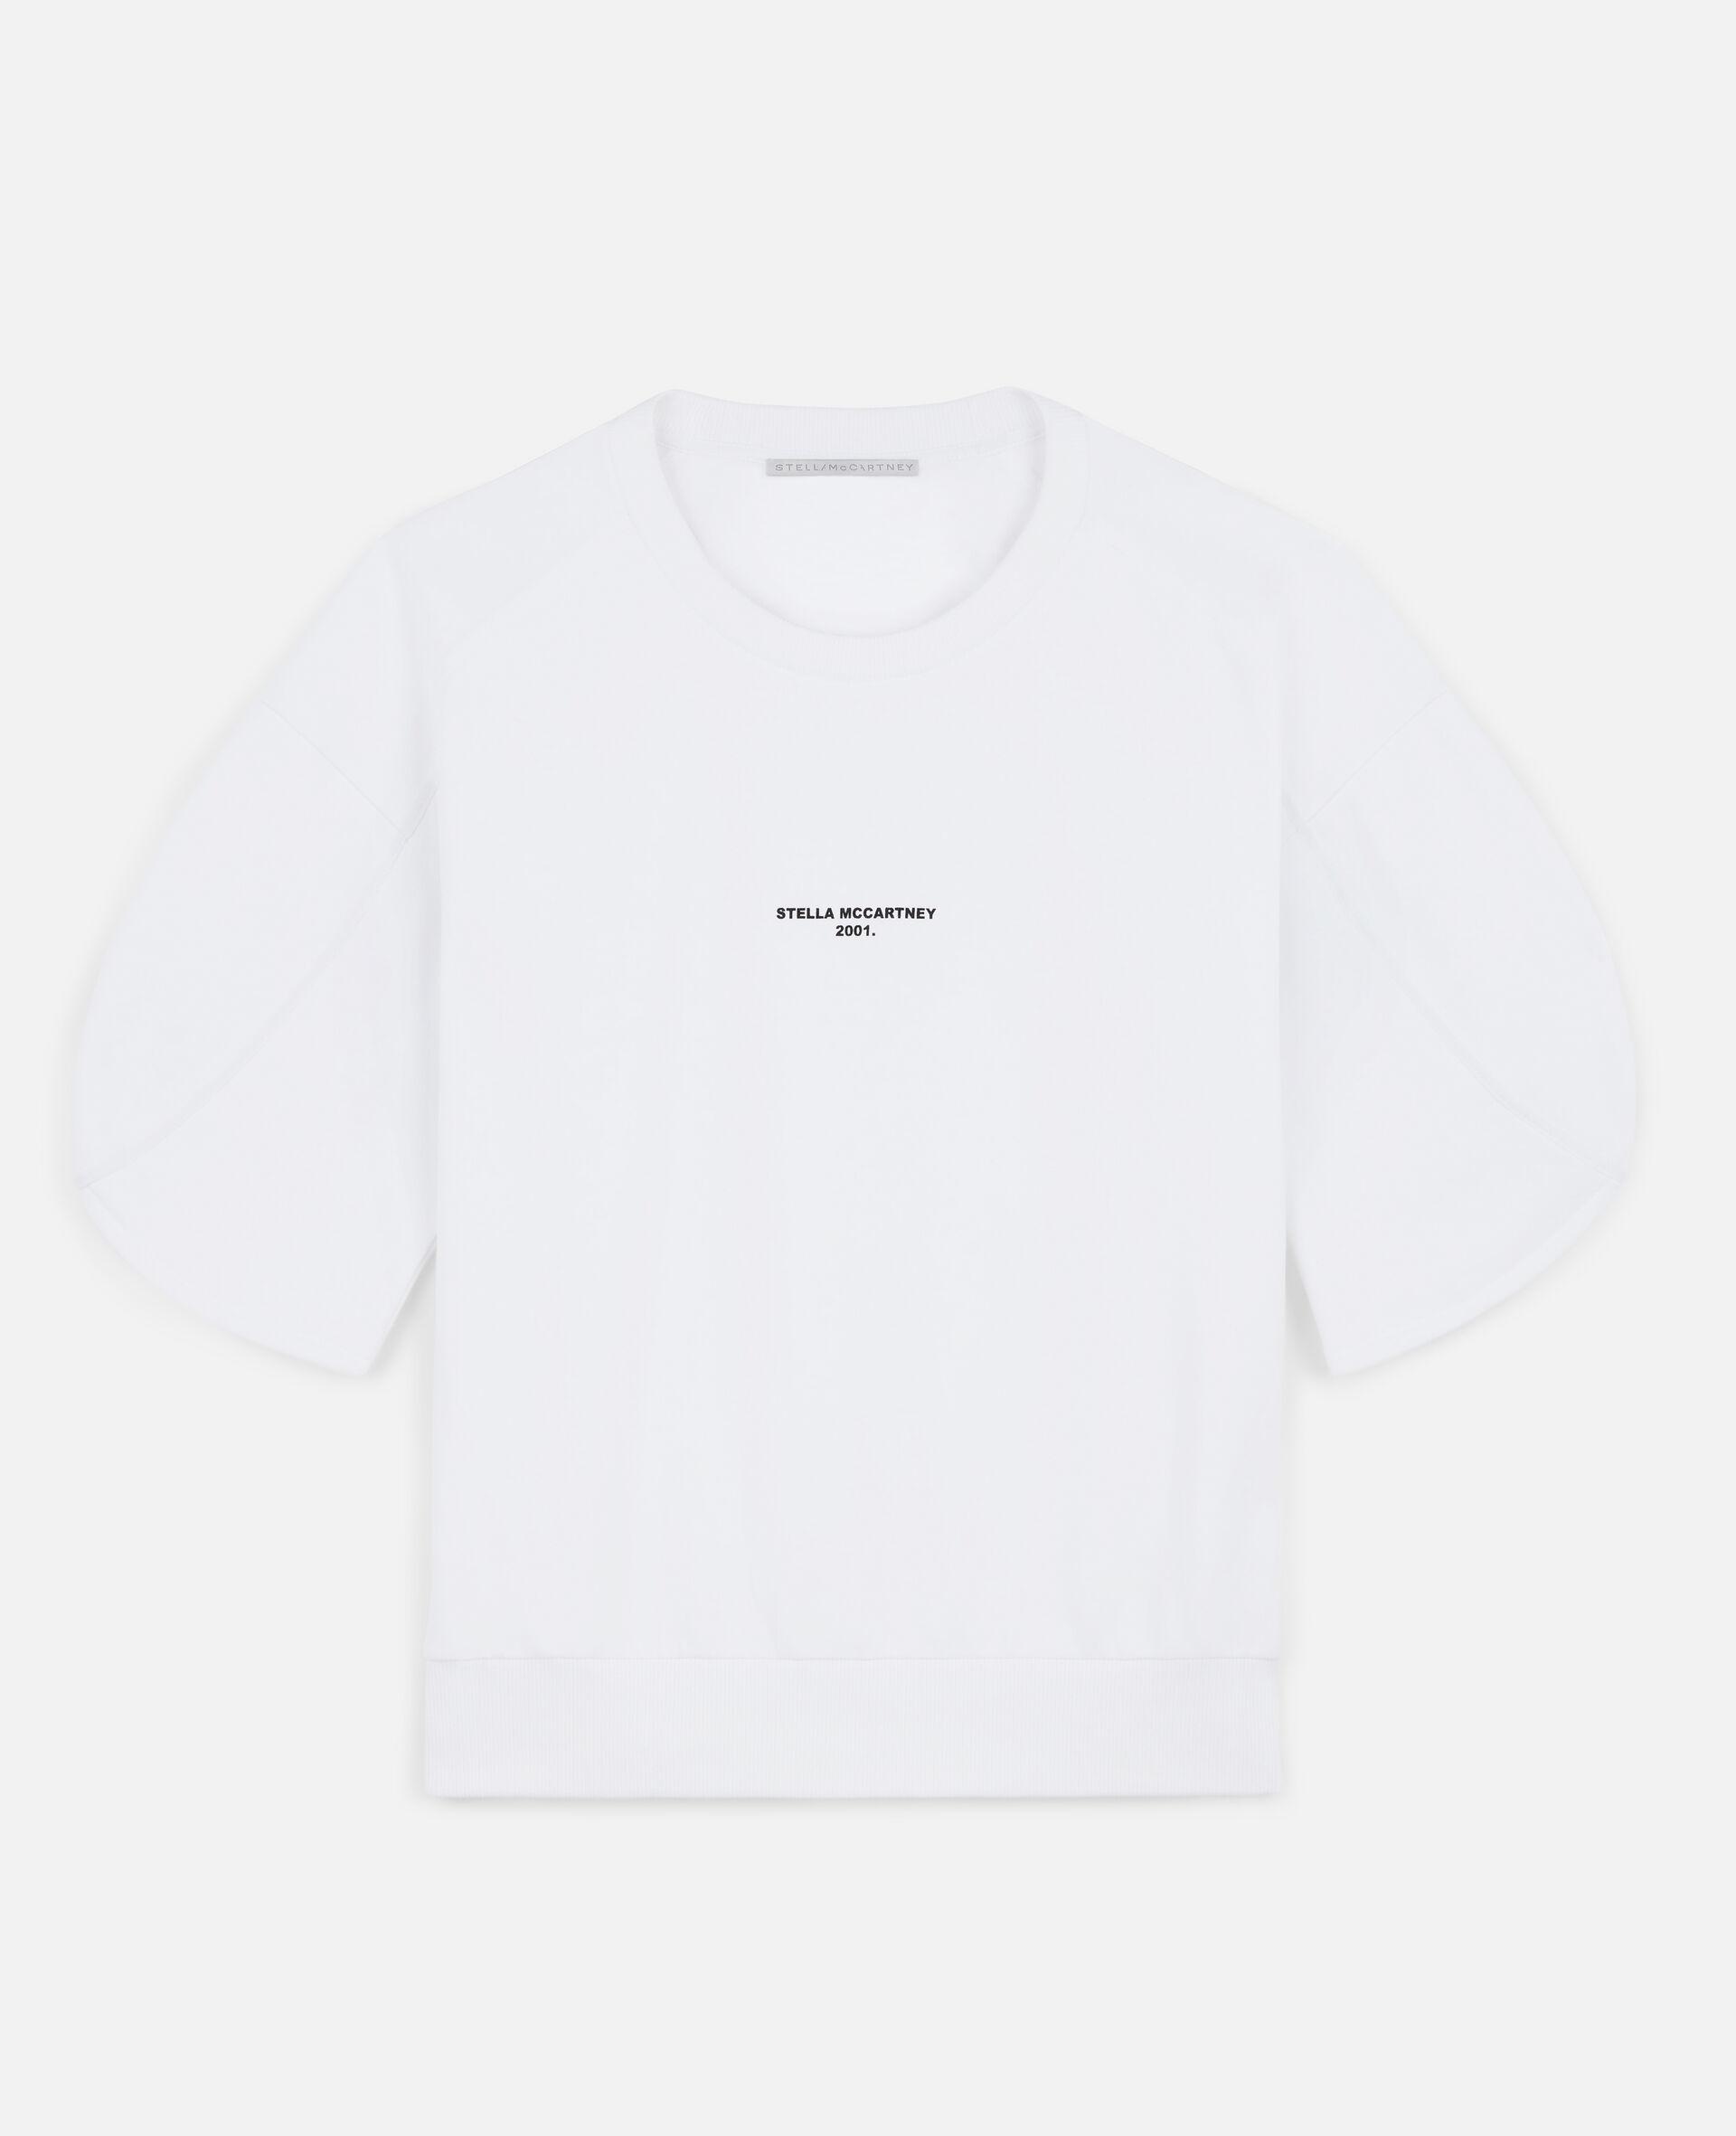 Stella McCartney 2001. Sweat-shirt-Blanc-large image number 0